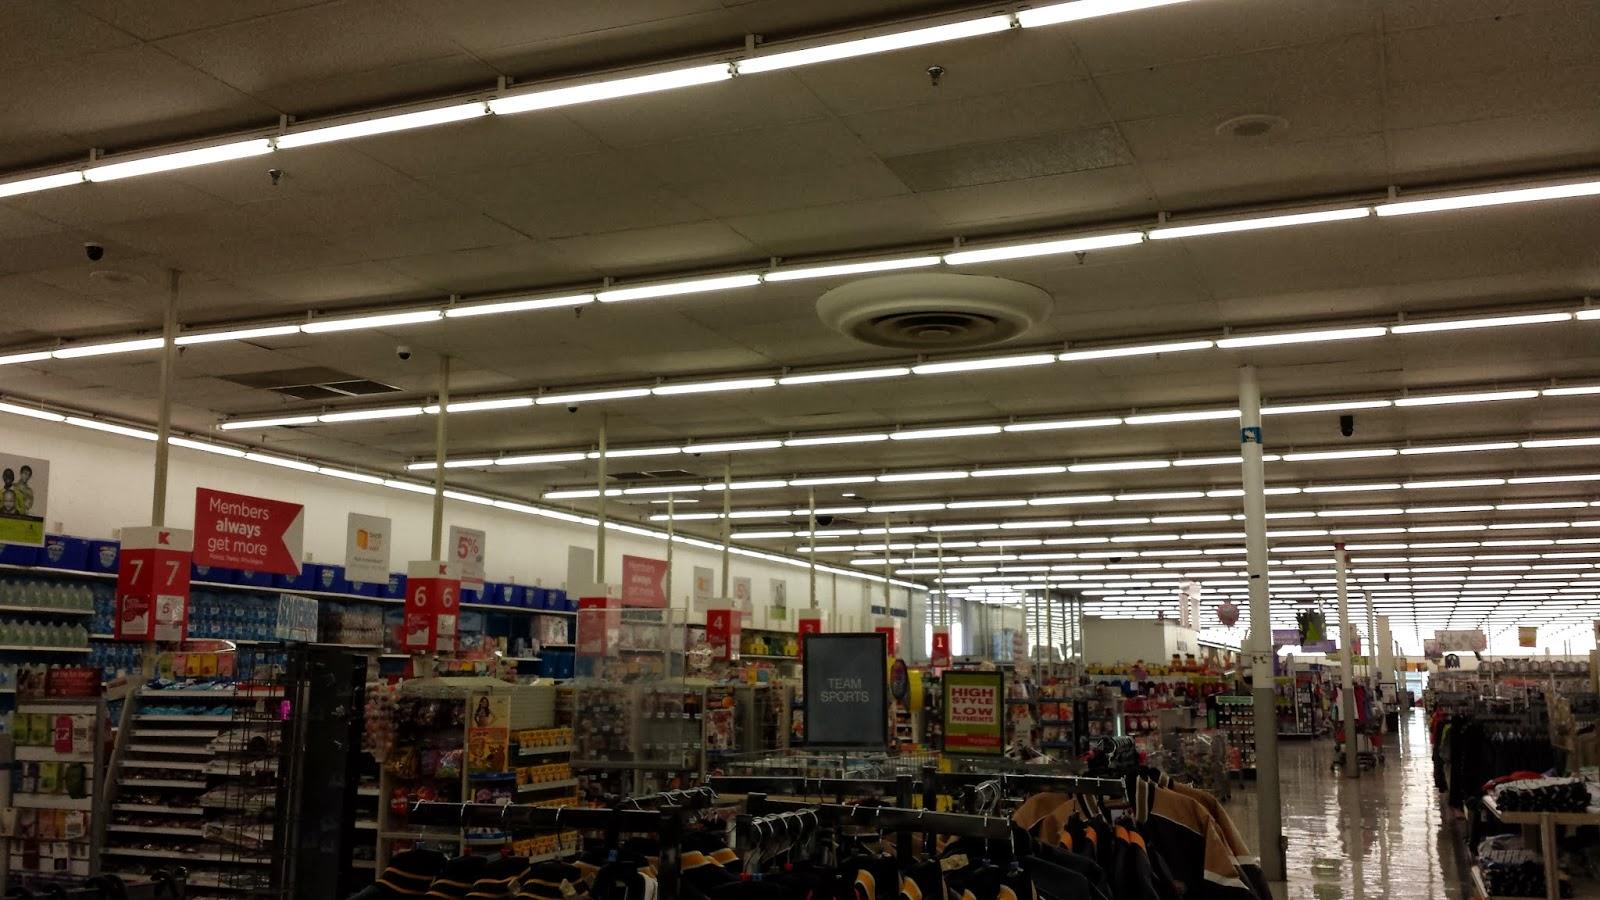 Toys At Kmart : Louisiana and texas southern malls retail kmart